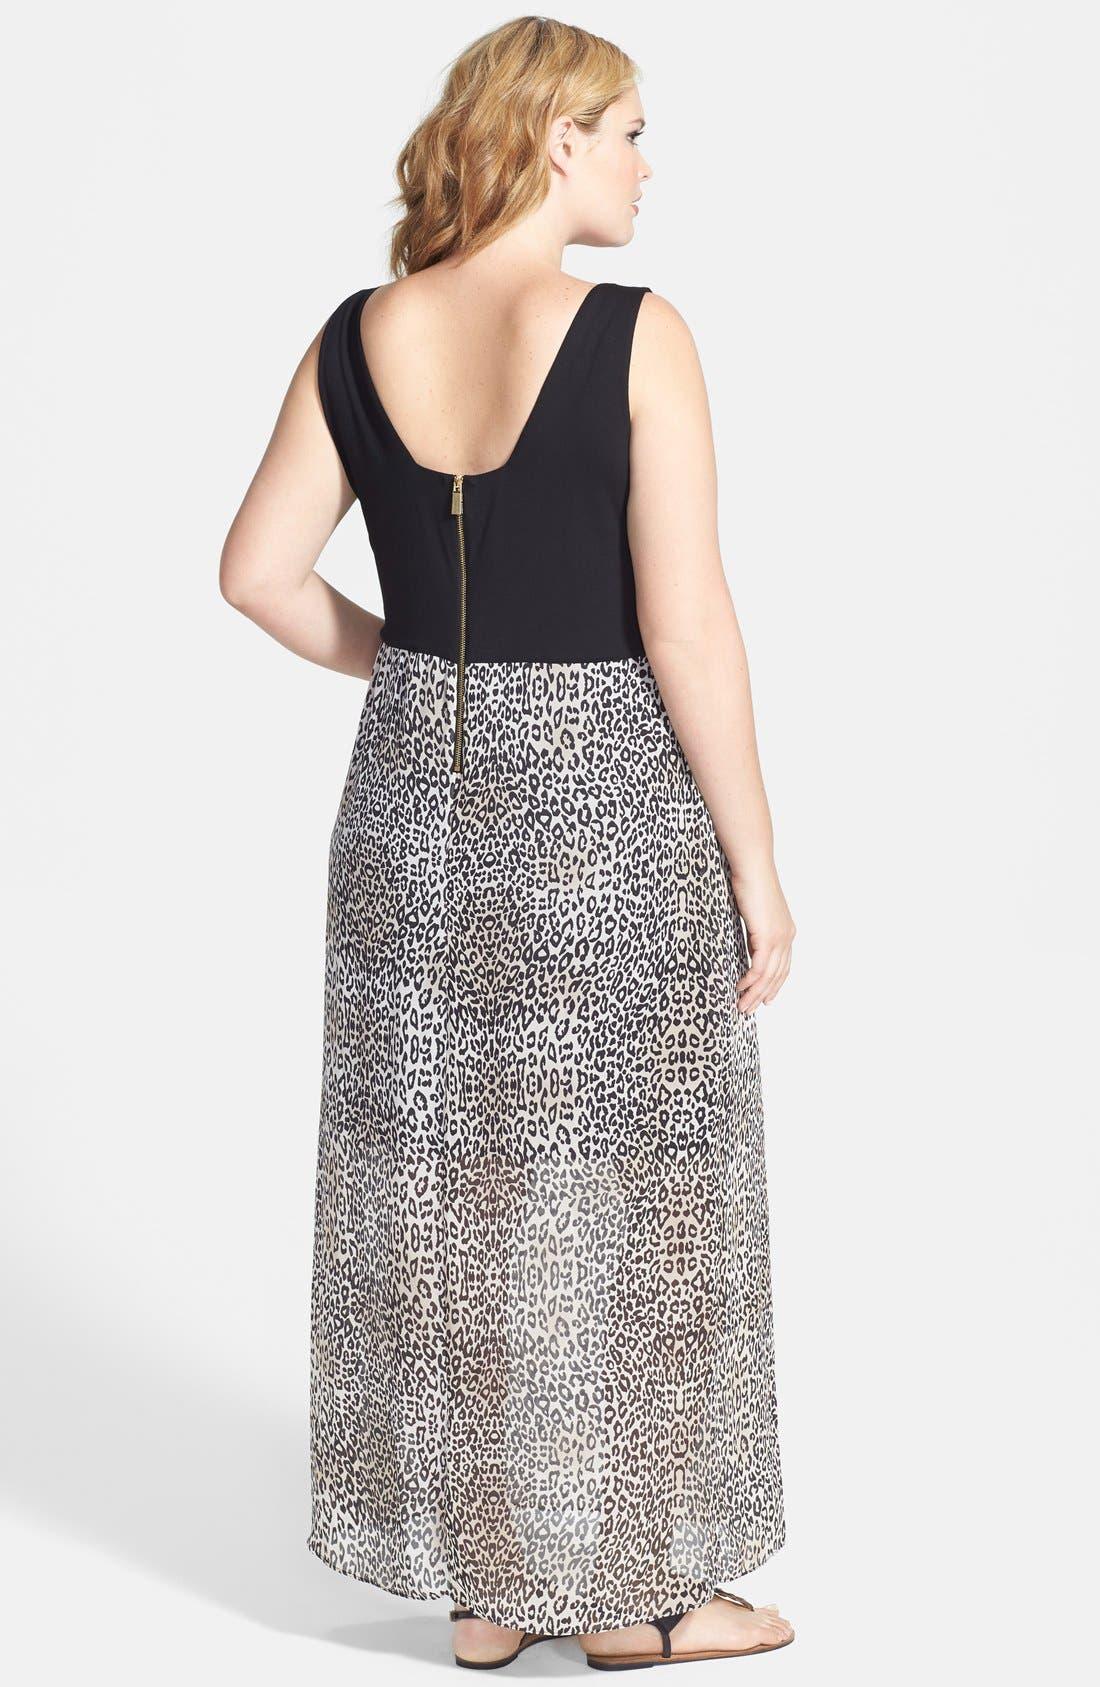 Alternate Image 2  - Vince Camuto 'Desert Leopard' Chiffon Overlay Maxi Dress (Plus Size)